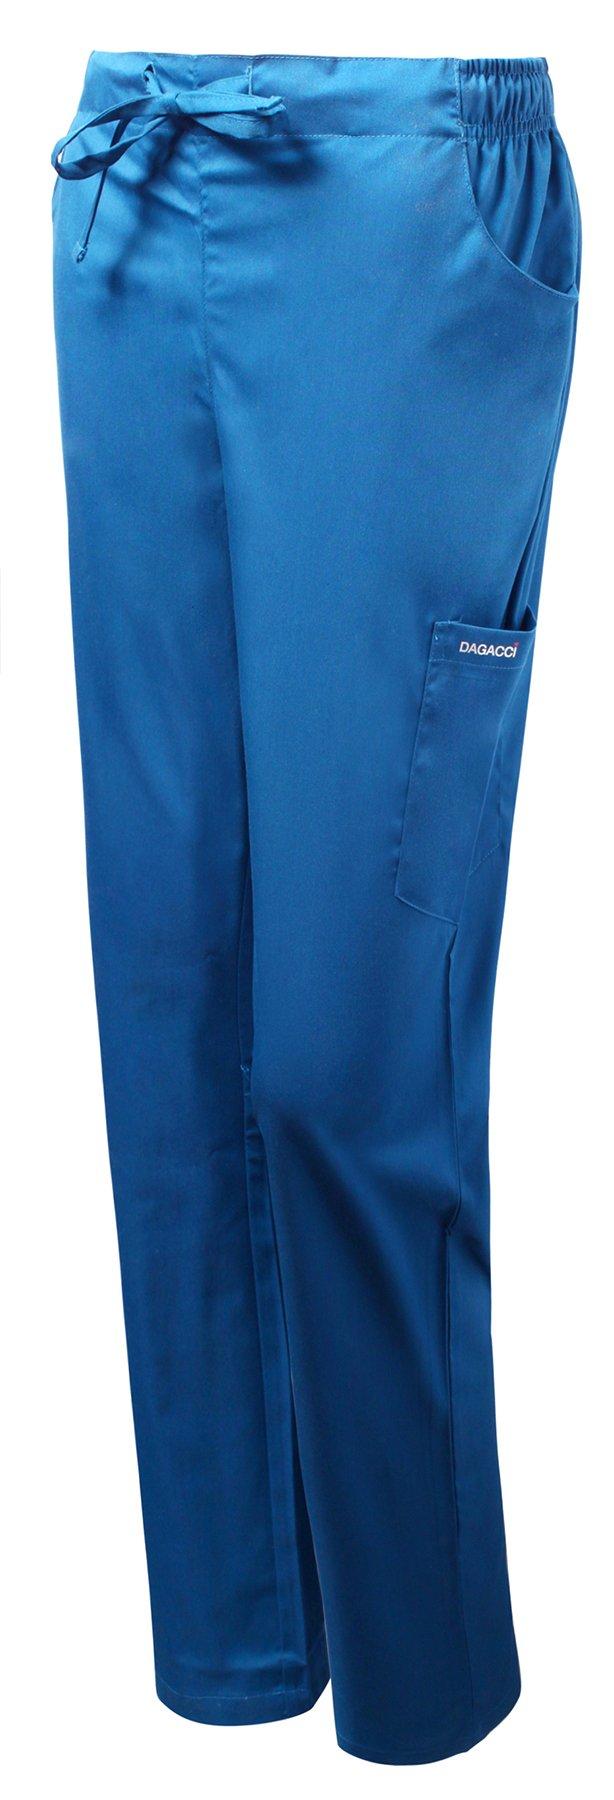 Dagacci Medical Uniform Women's Scrub Natural Stretch Y-Neck Stitch Tape Top (Royal Blue, X-Large)